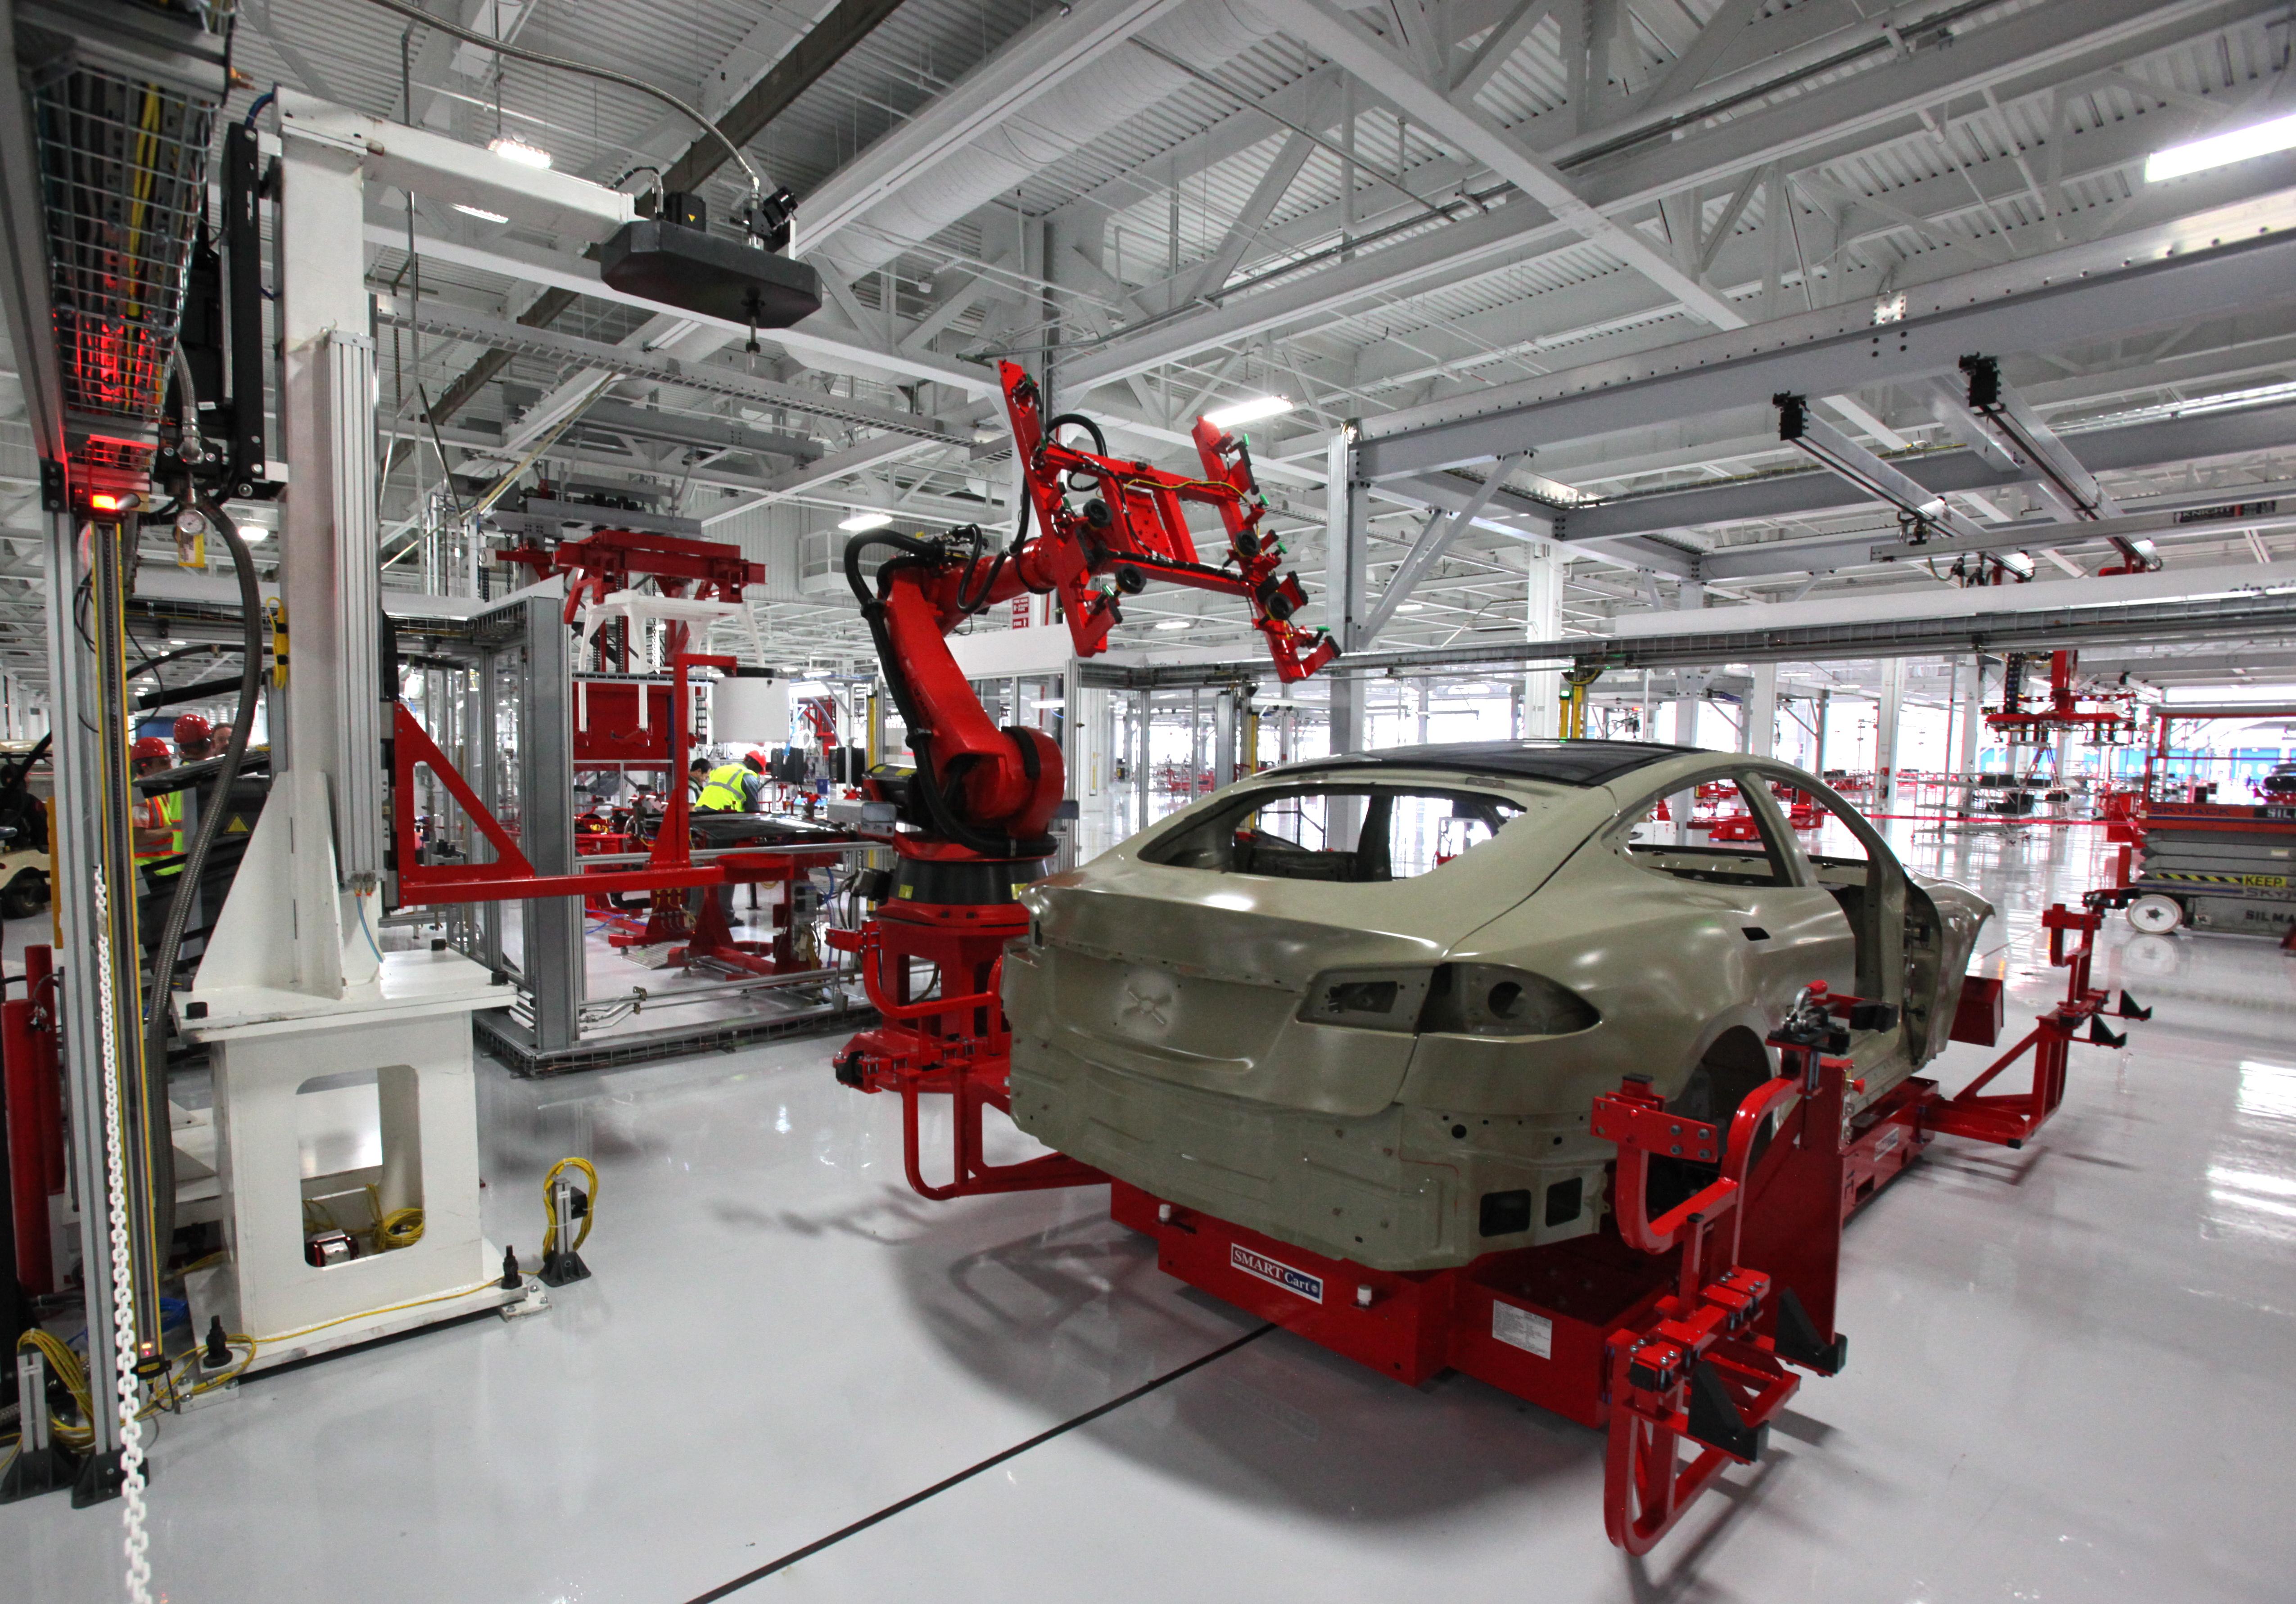 Tesla_auto_bots (1)